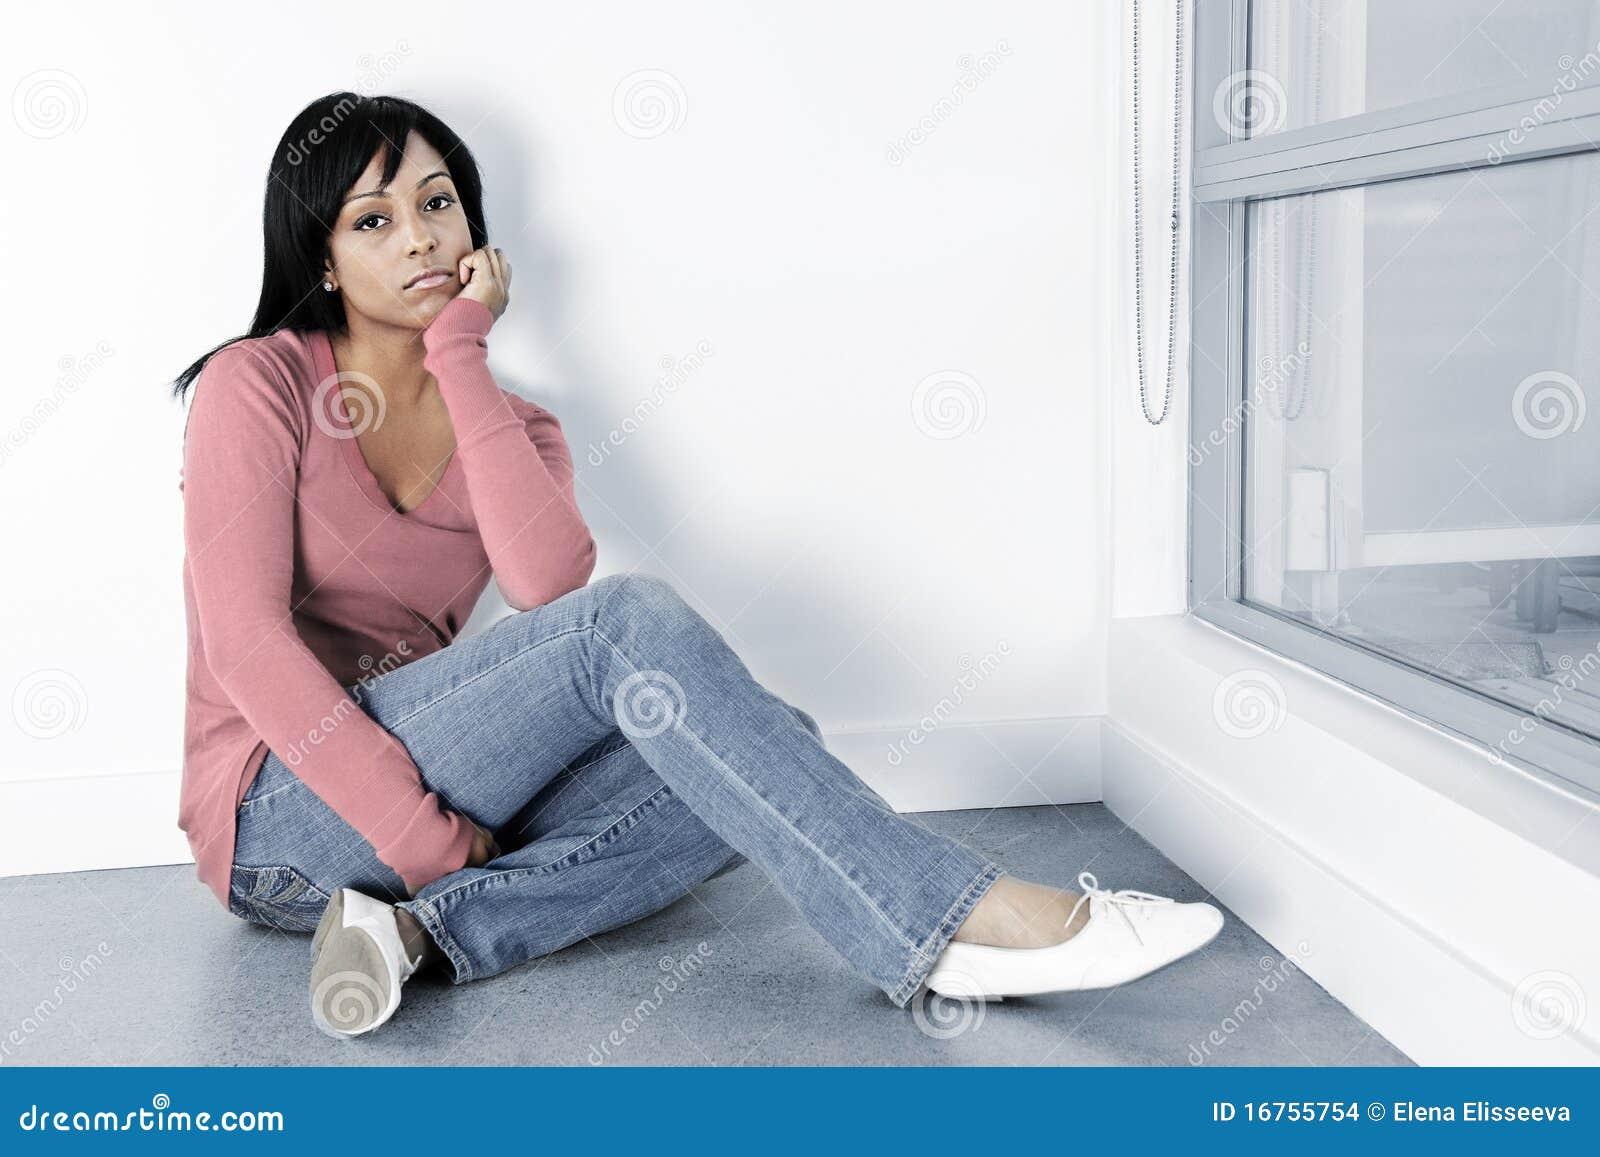 Depressed woman sitting on the floor stock photo image for On the floor on the floor